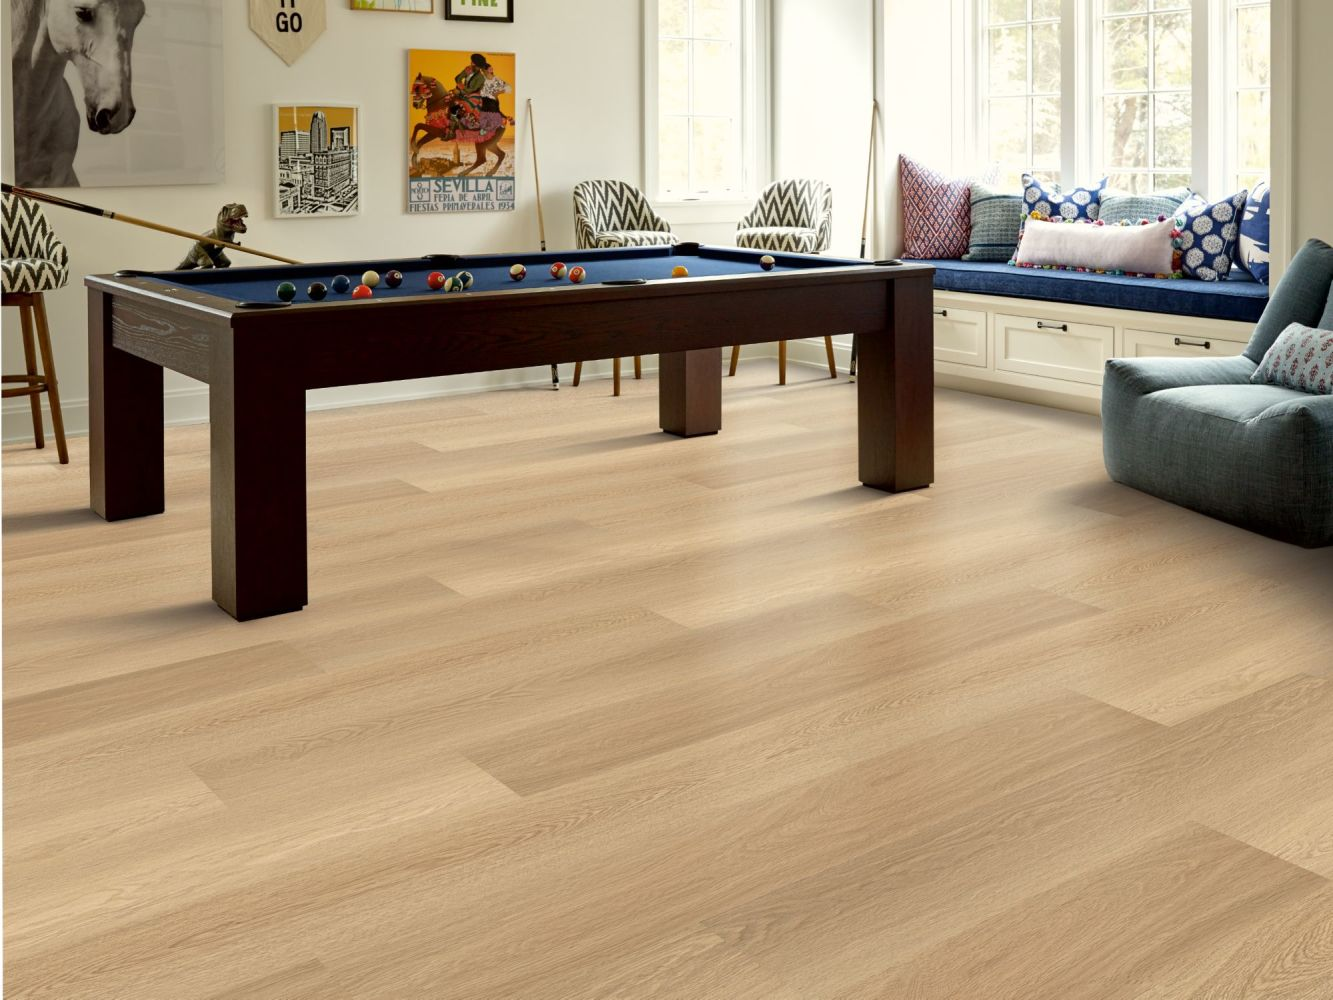 Shaw Floors Vinyl Residential Endura 512c Plus Castaway 07087_0736V